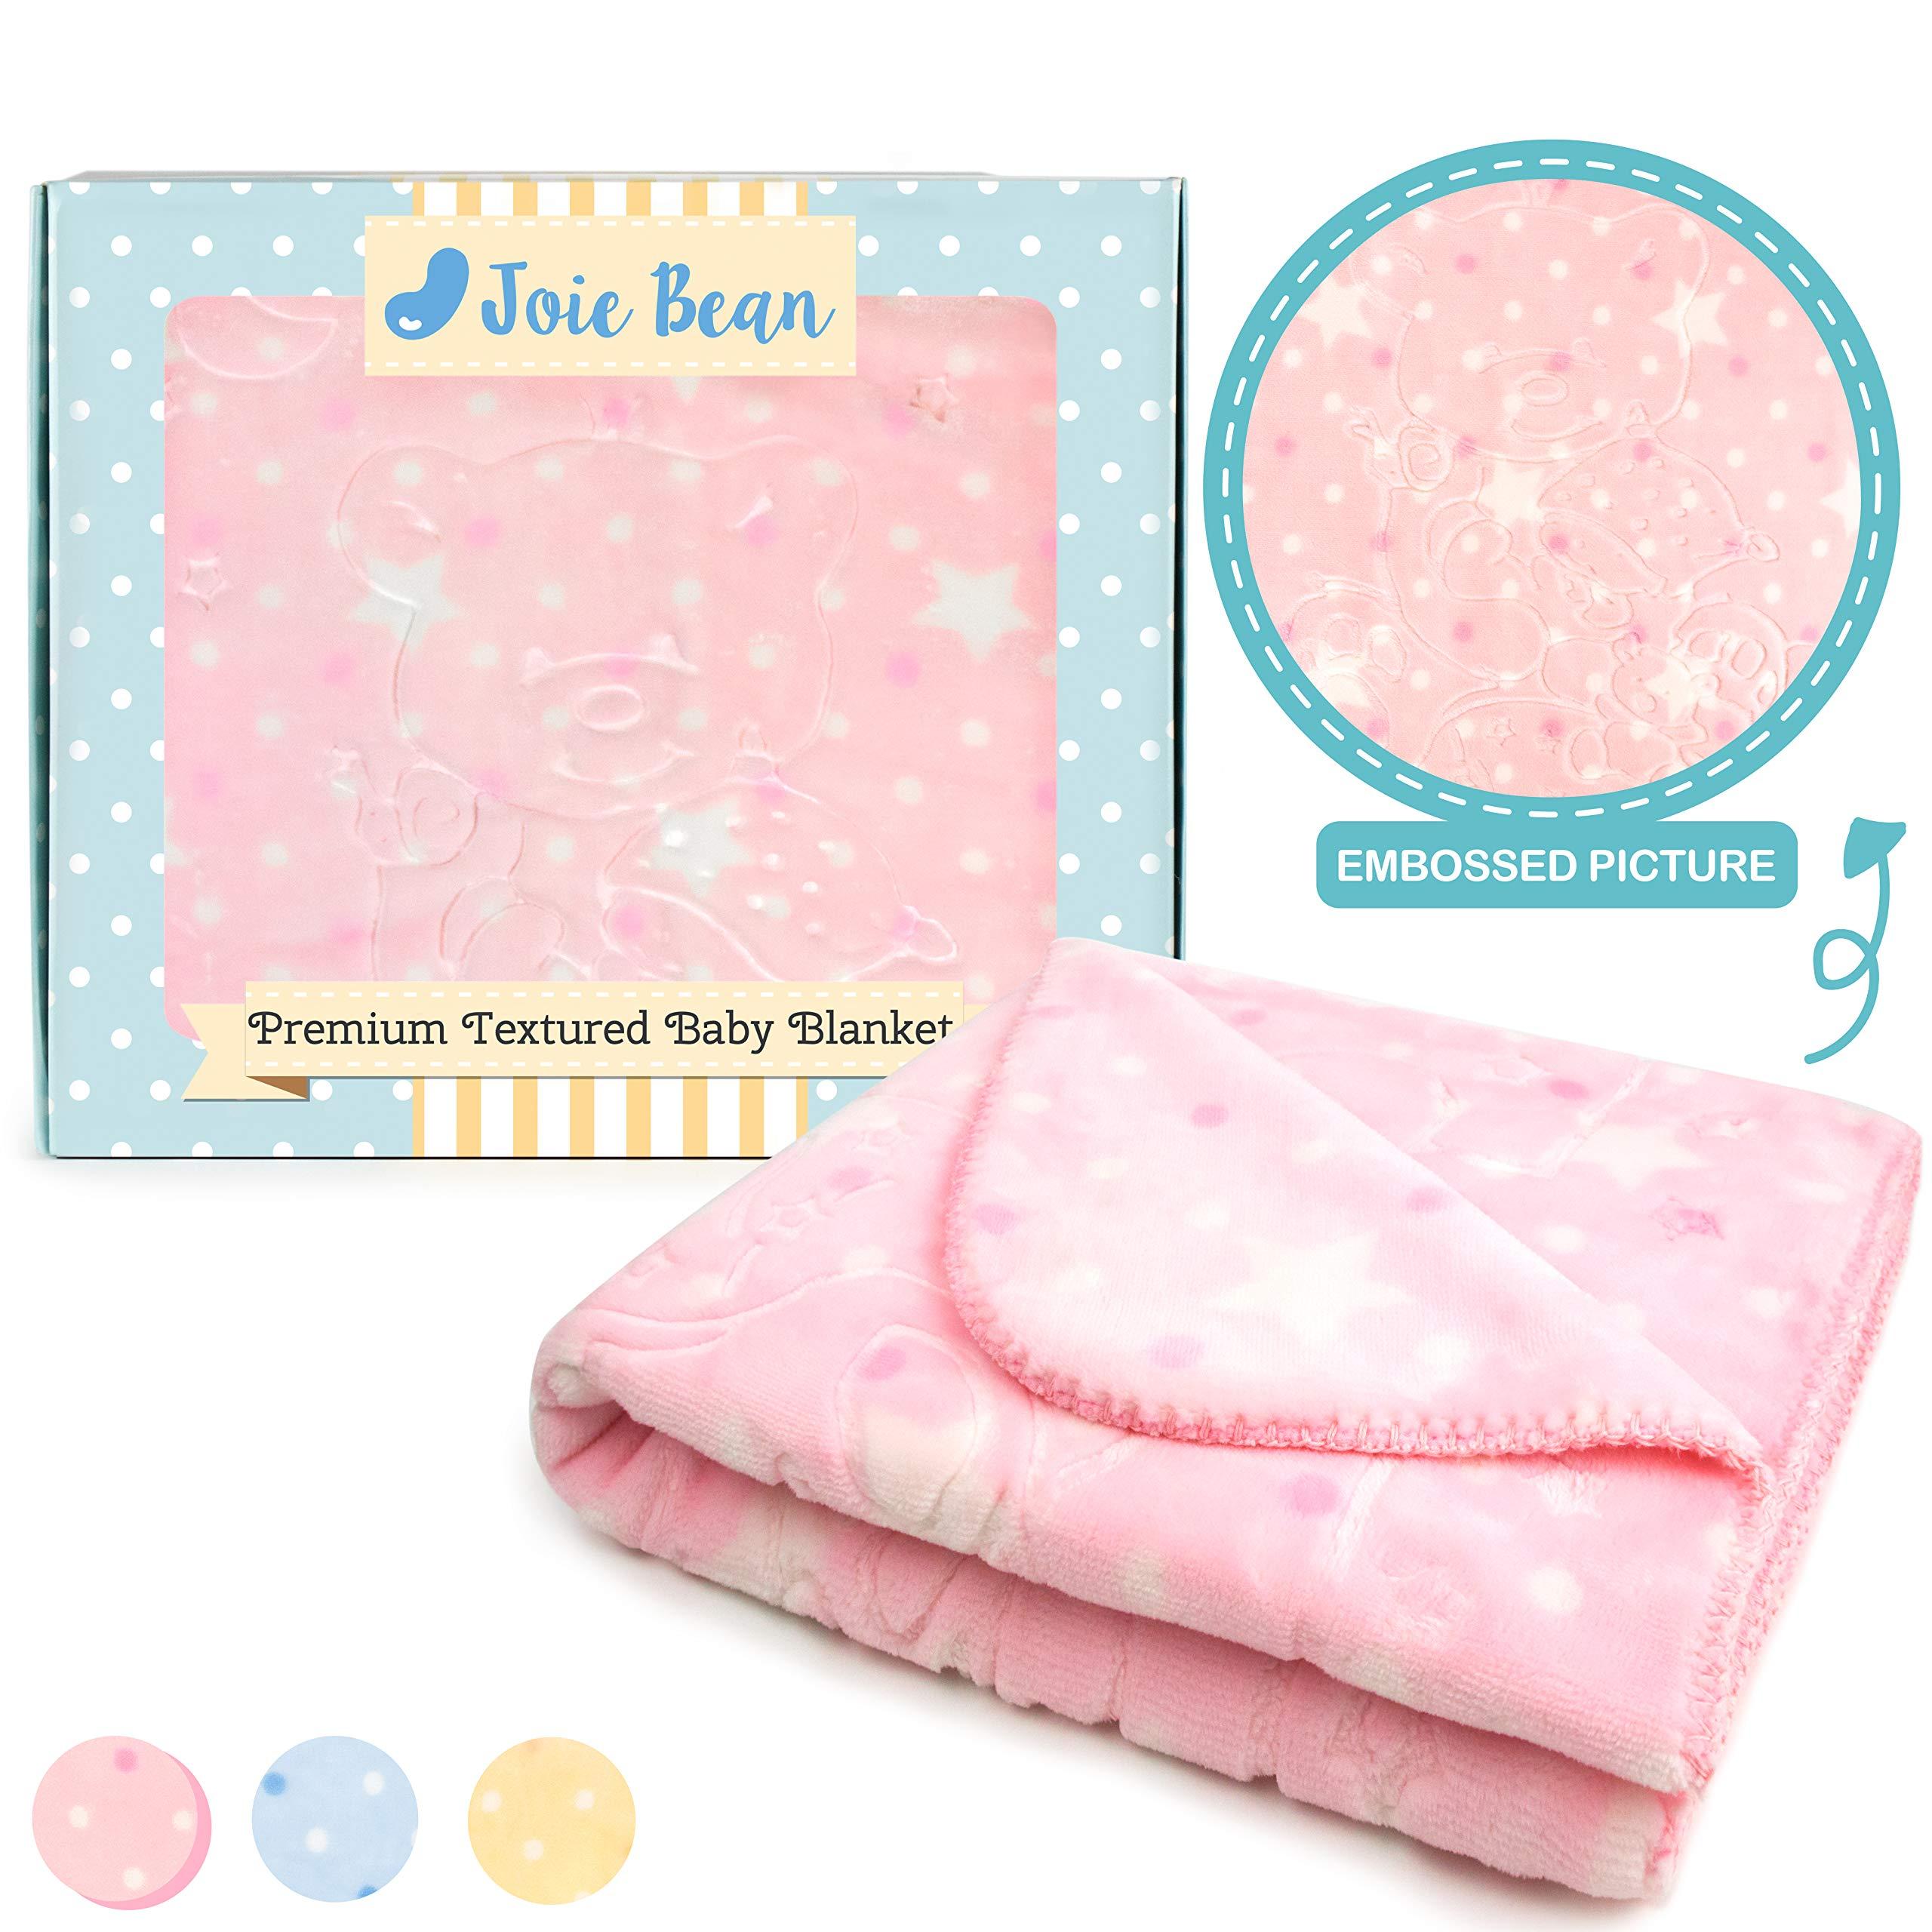 Amazon.com: JOIE BEAN Soft Plush Baby Blanket| Infant